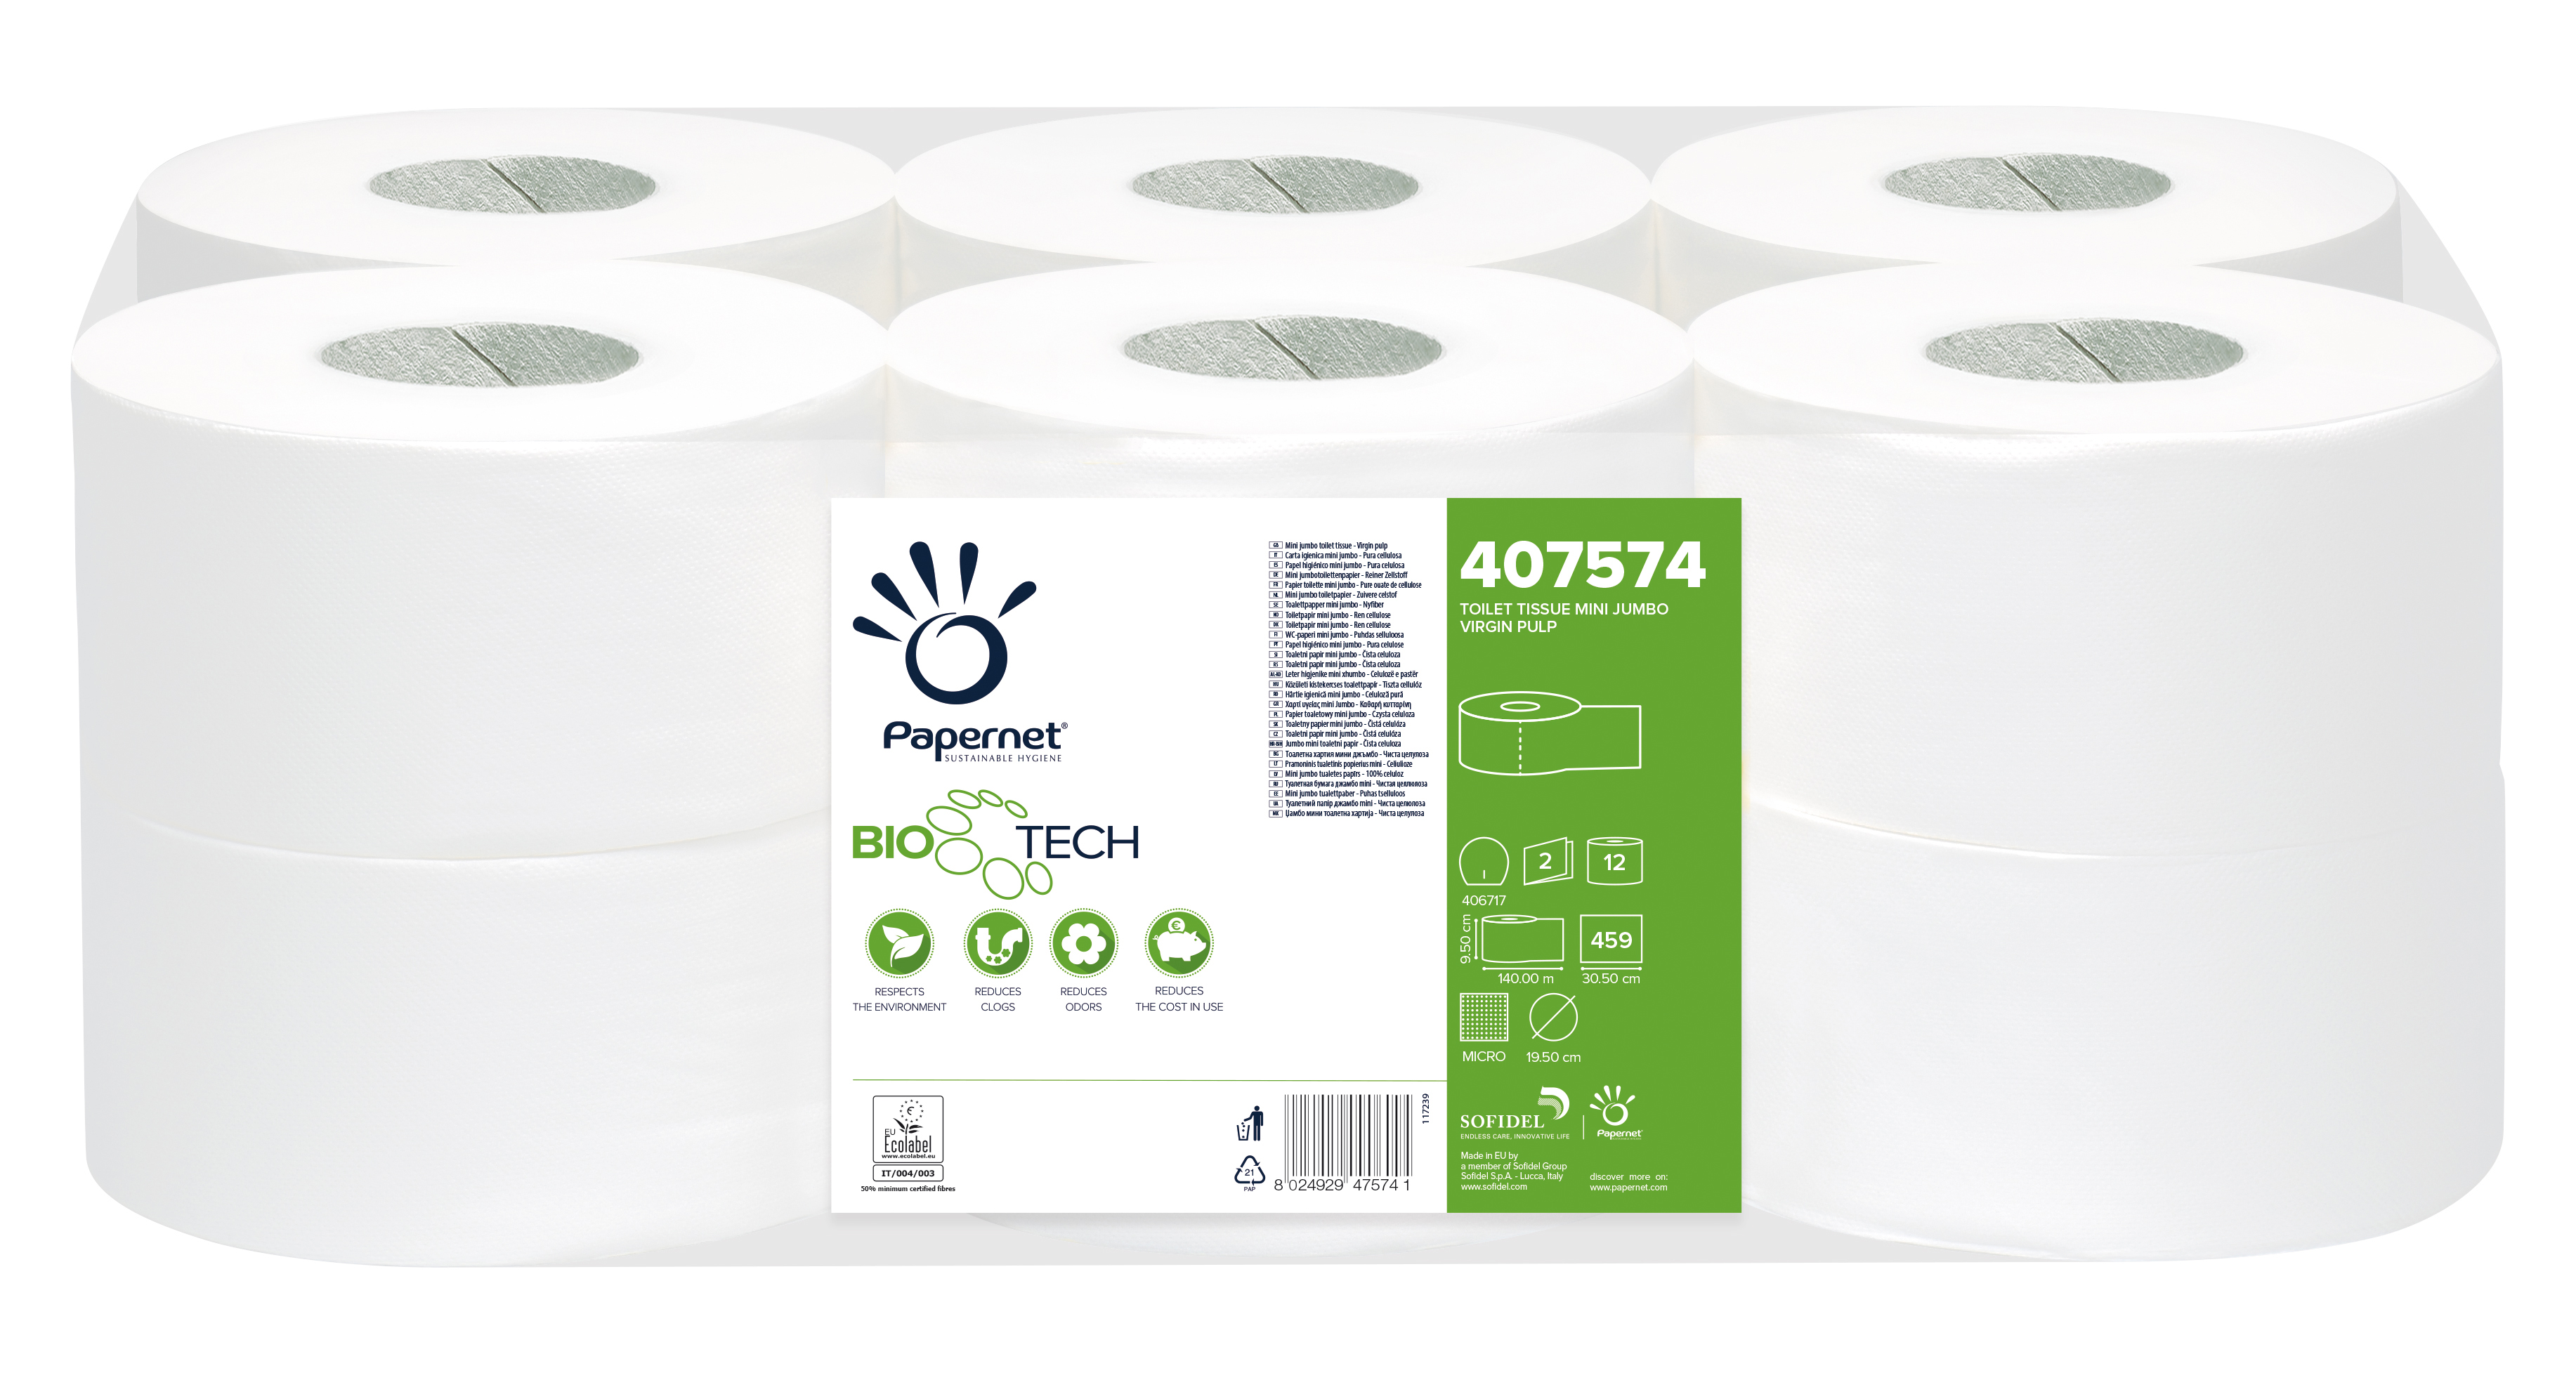 Papernet® WC Mini Jumbo rull BioTech, pakis 12x140m, 2-kihiline, valge